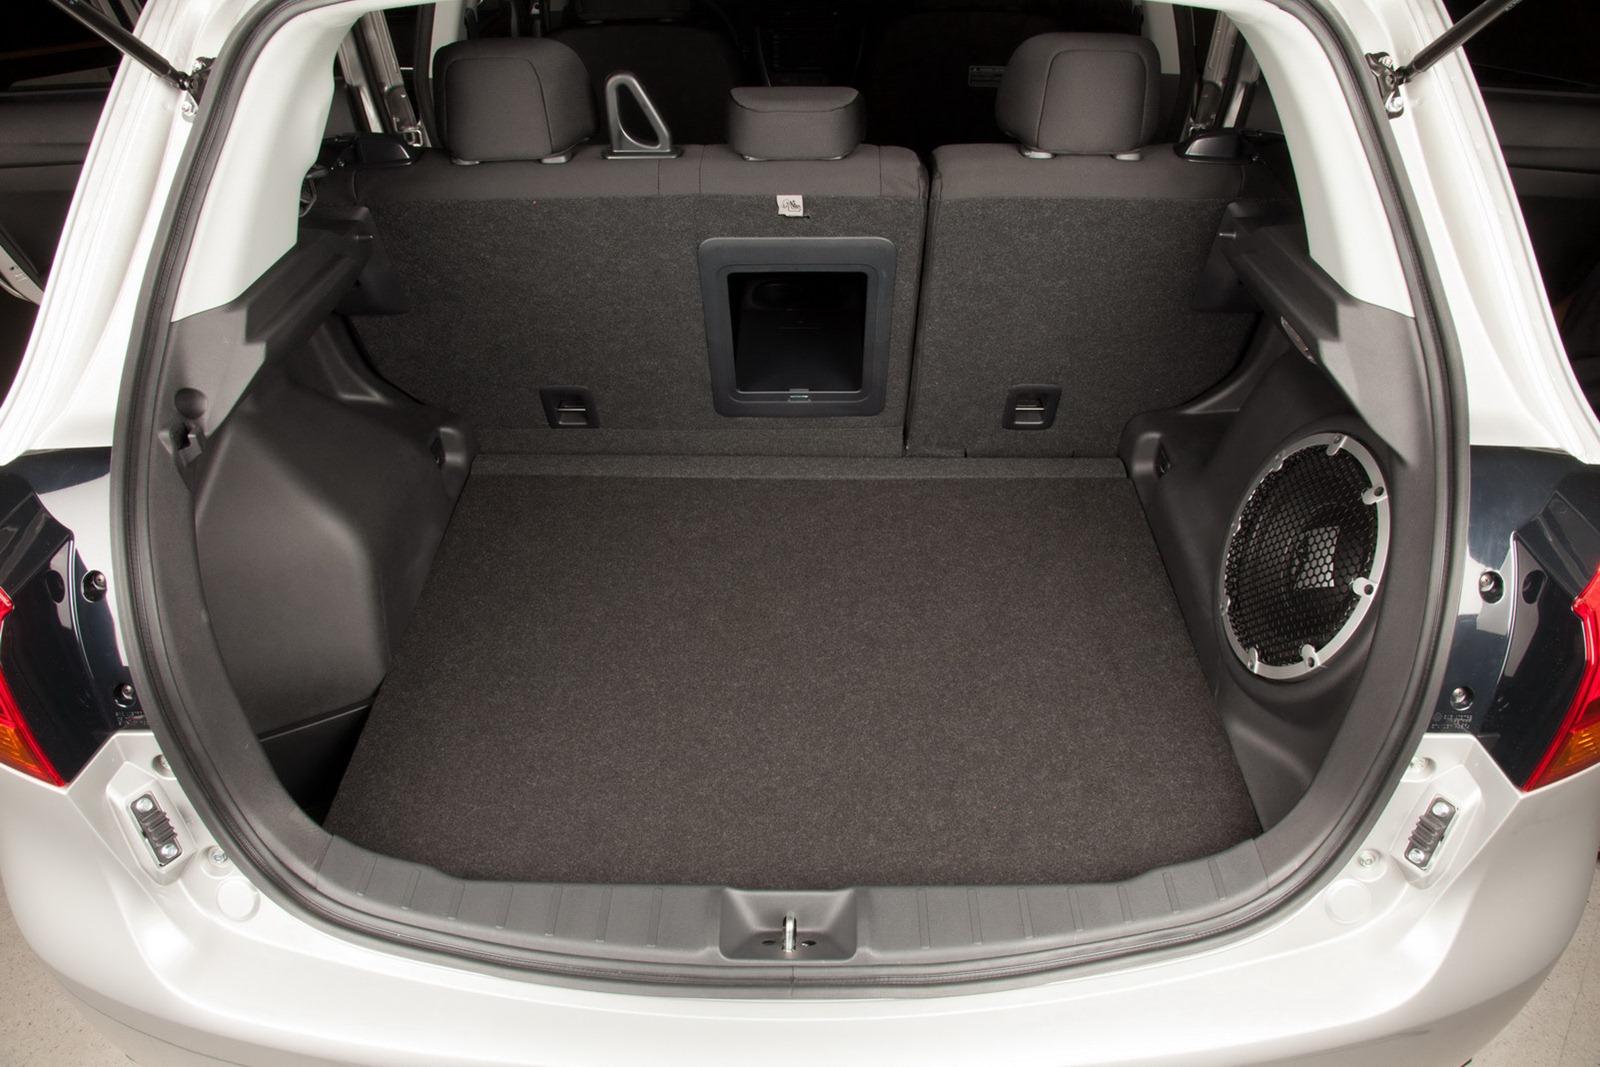 thumbs 2013 mitsubishi outlander sport interior 1 thumbs 2013 mitsubishi outlander sport interior 1 - Mitsubishi Outlander Interior